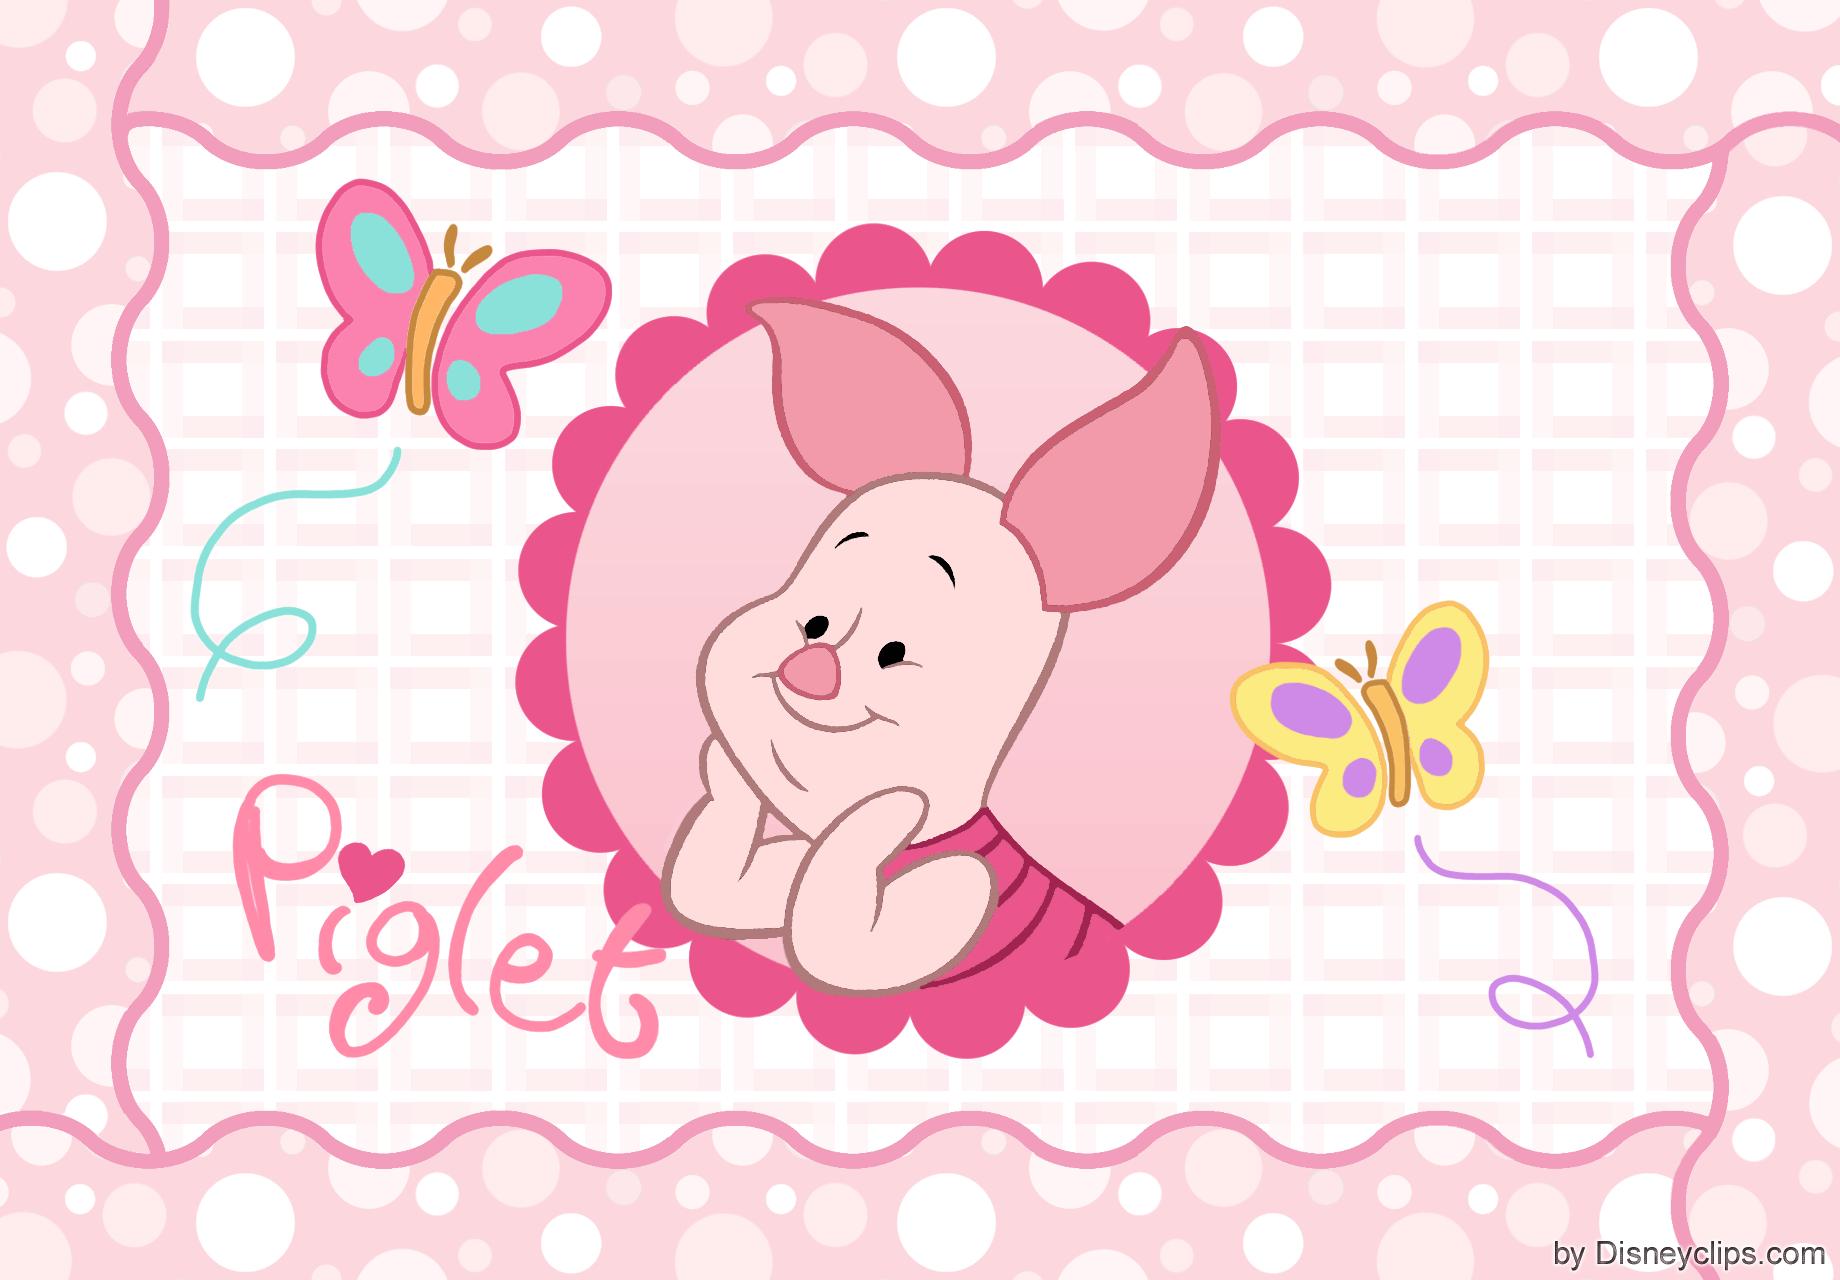 Winnie the pooh wallpaper disney freebies 1840x1035 tablet wallpaper voltagebd Gallery